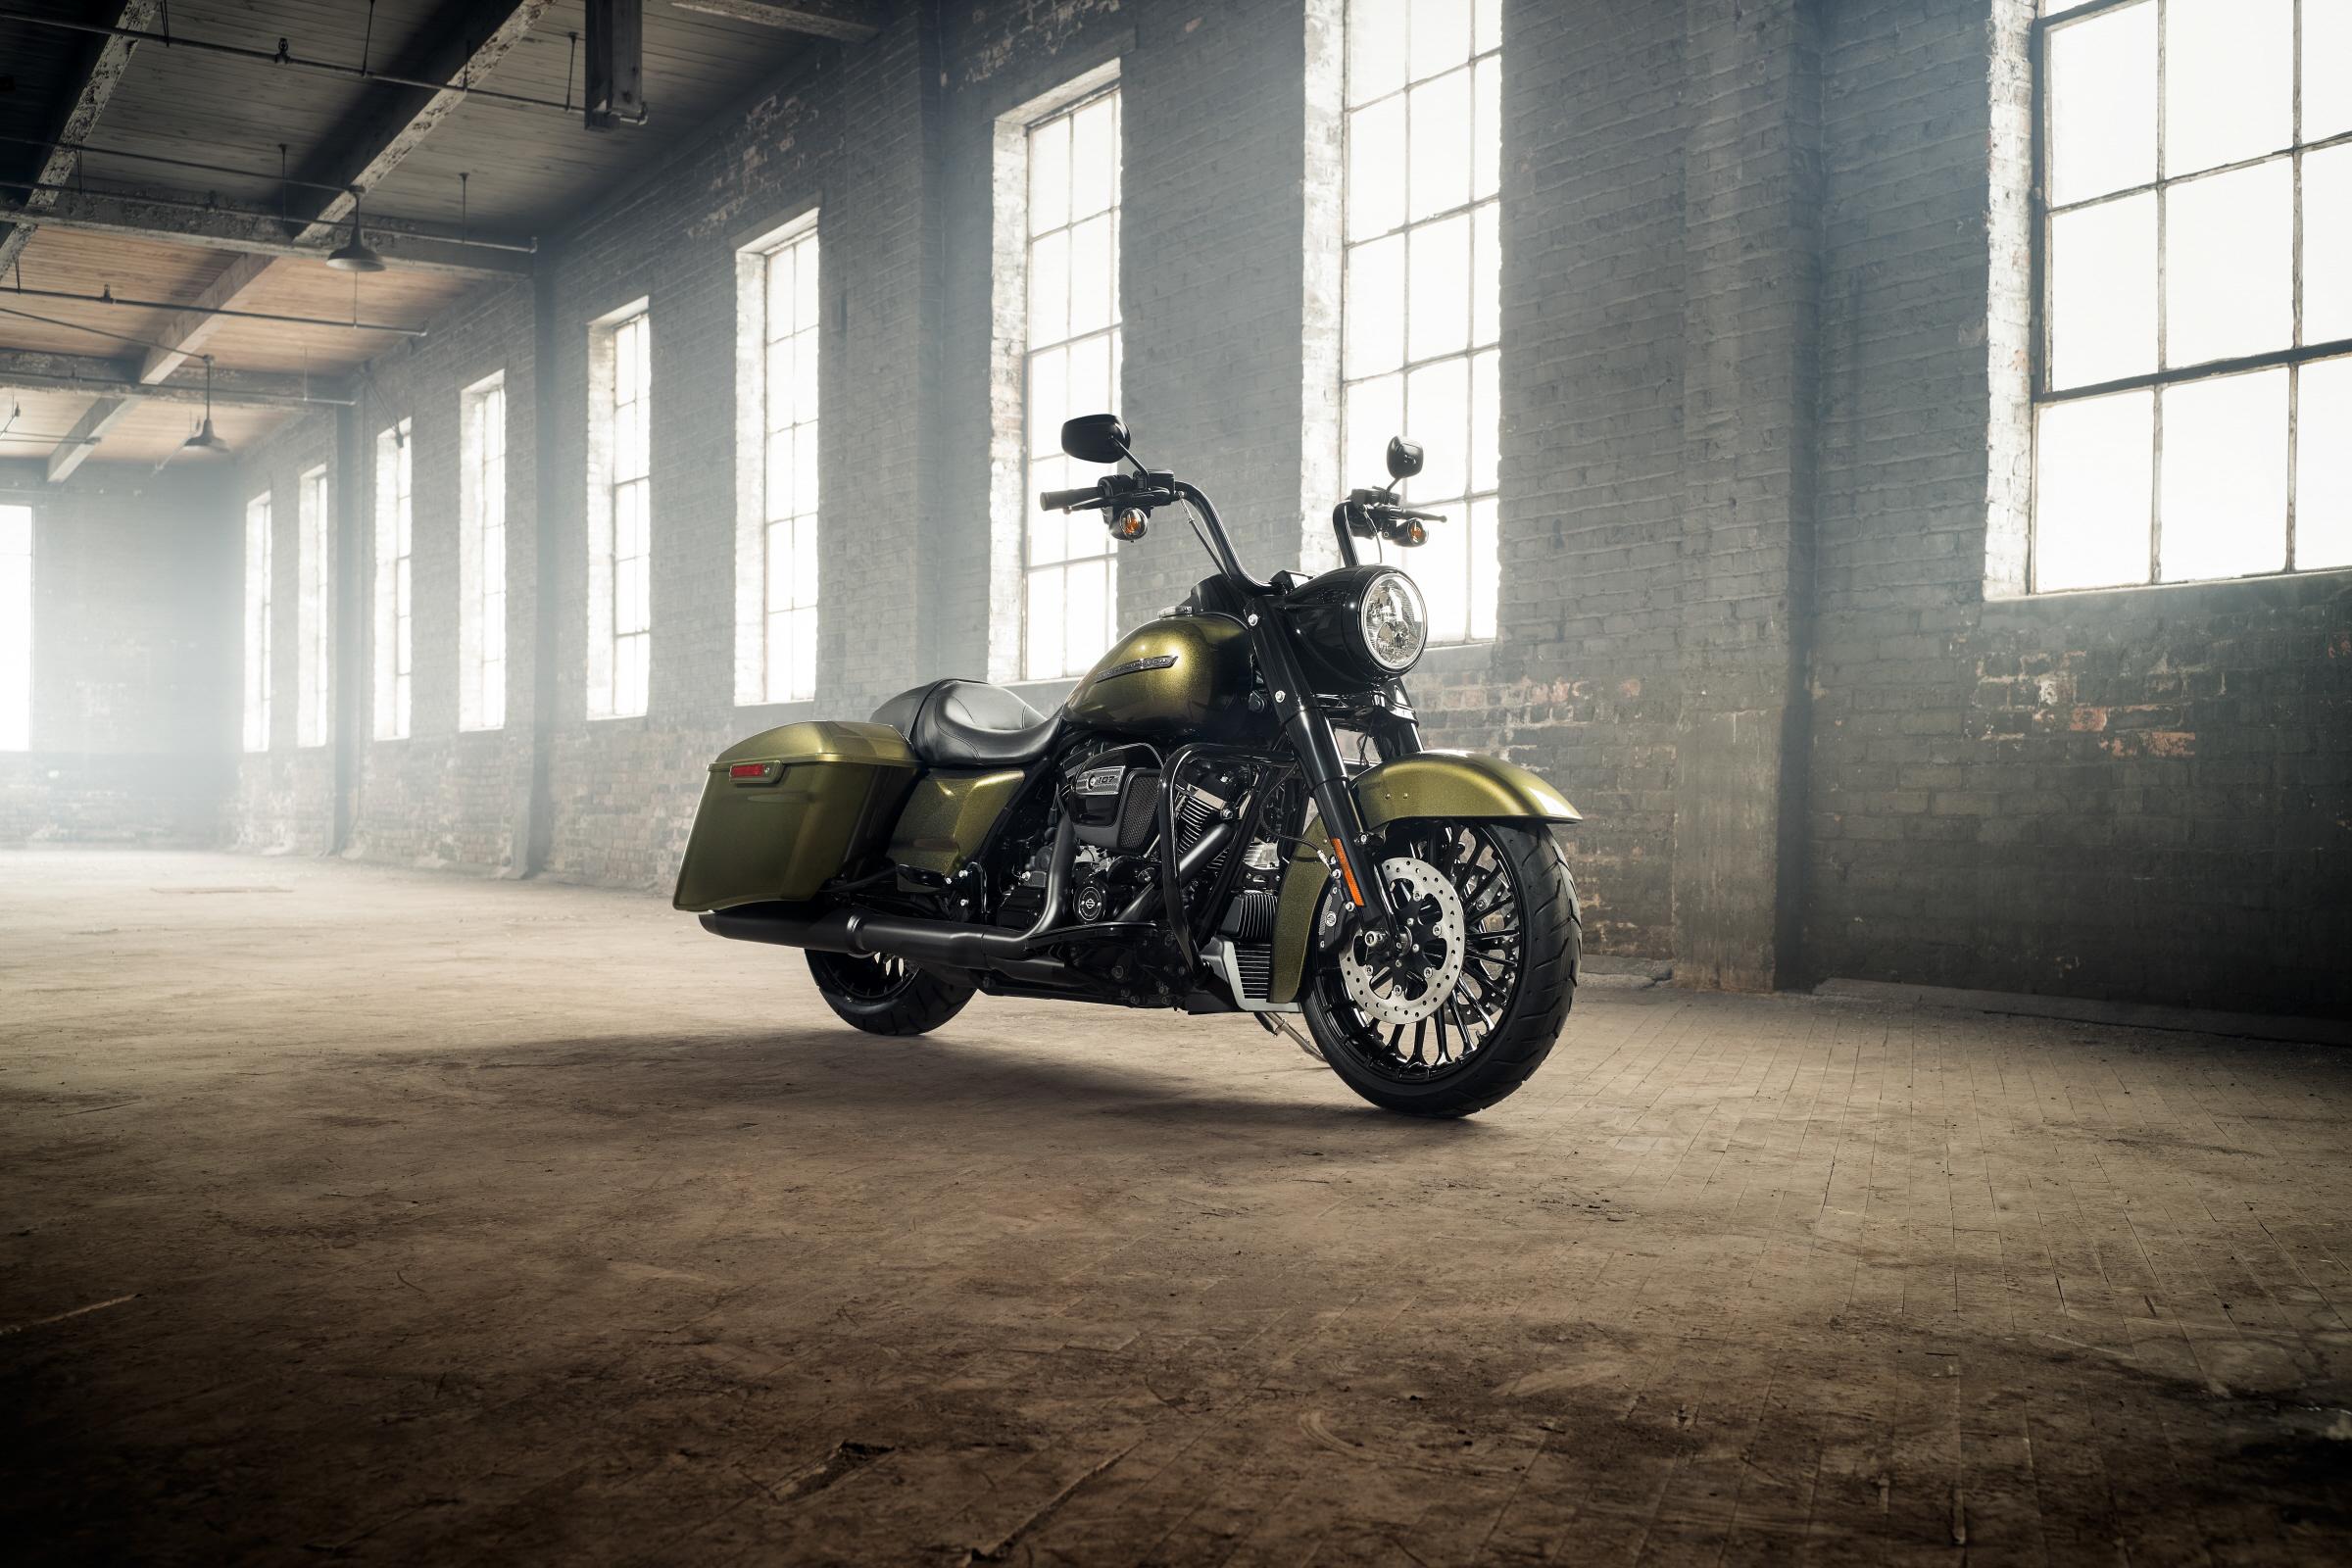 2017 Harley-Davidson® Road King Special.